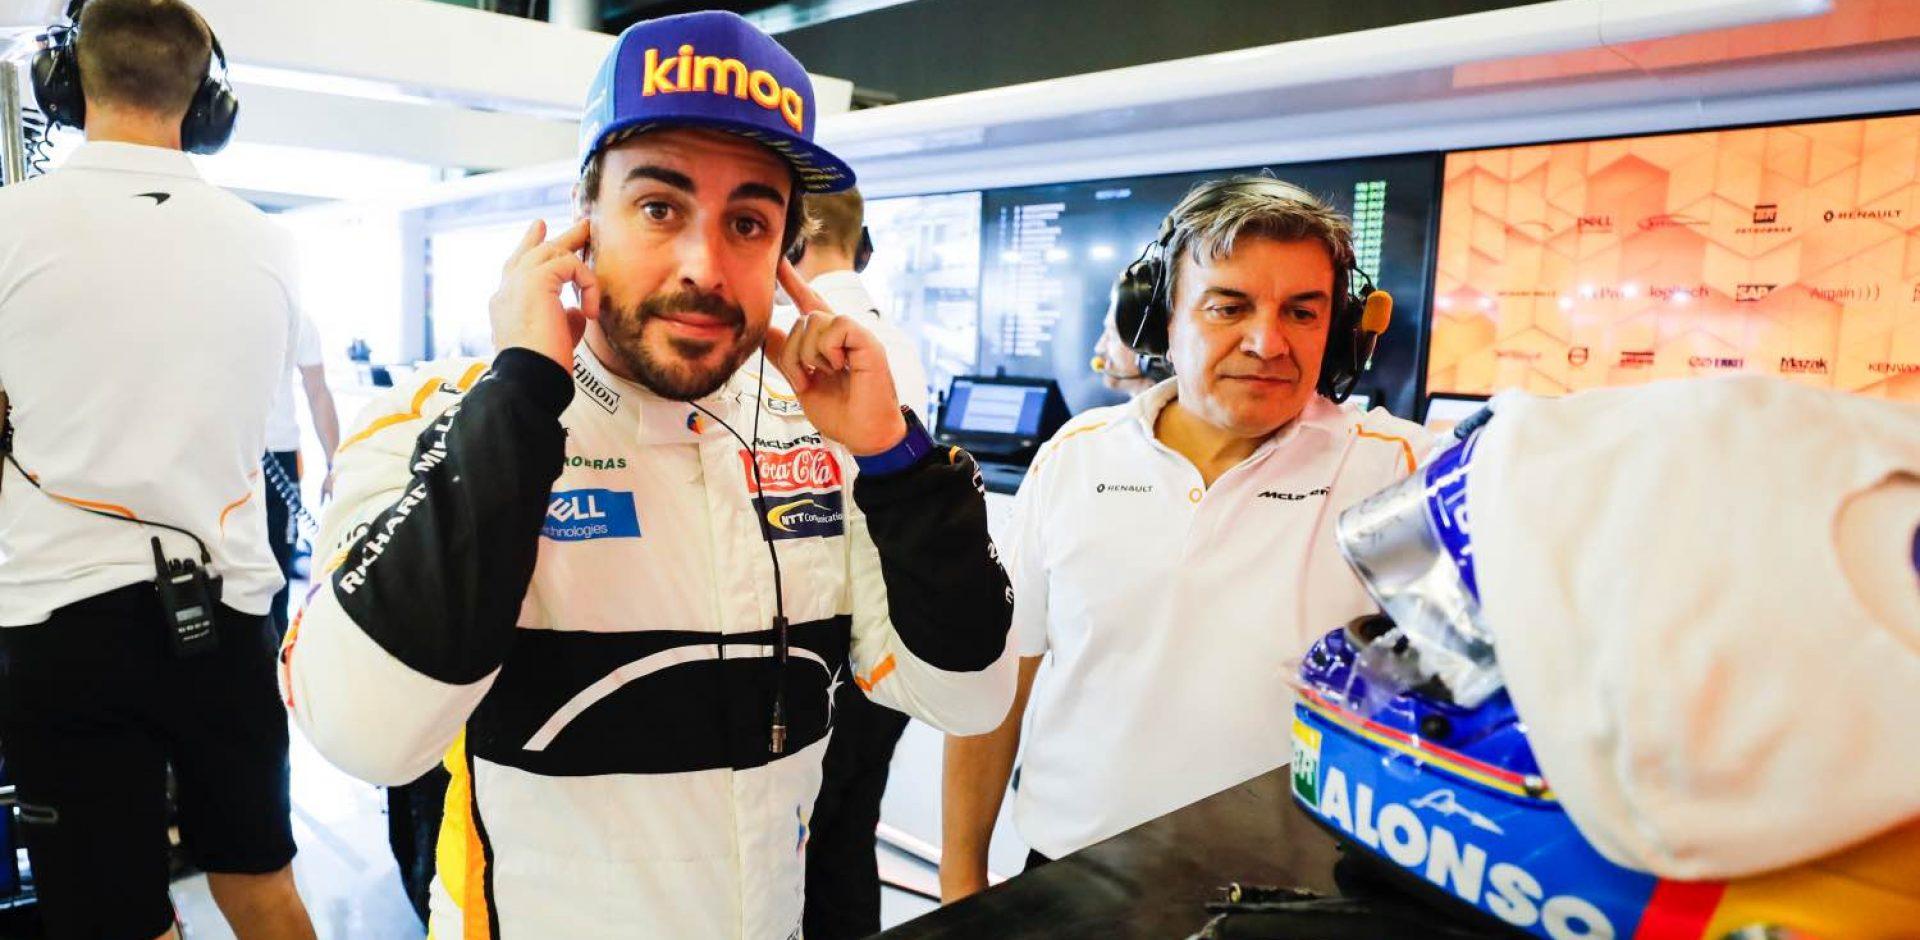 Yas Marina Circuit, Abu Dhabi, United Arab Emirates. Friday 23 November 2017. Fernando Alonso, McLaren. World Copyright: Steven Tee/McLaren ref: _2ST8808 Fabrizio Borra